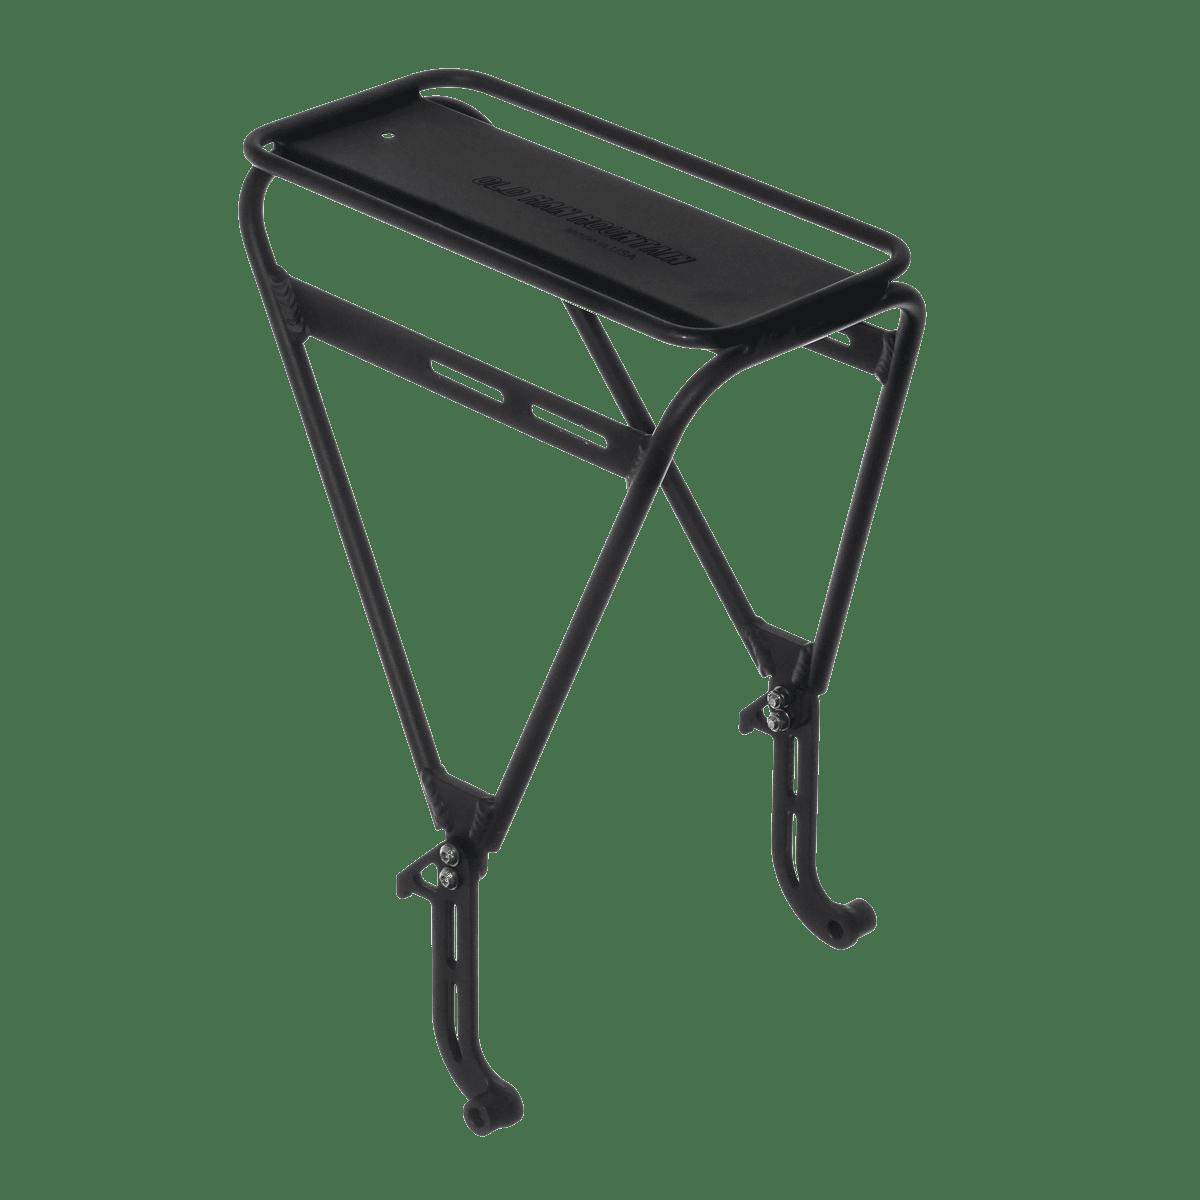 Classic bicycle cargo rack